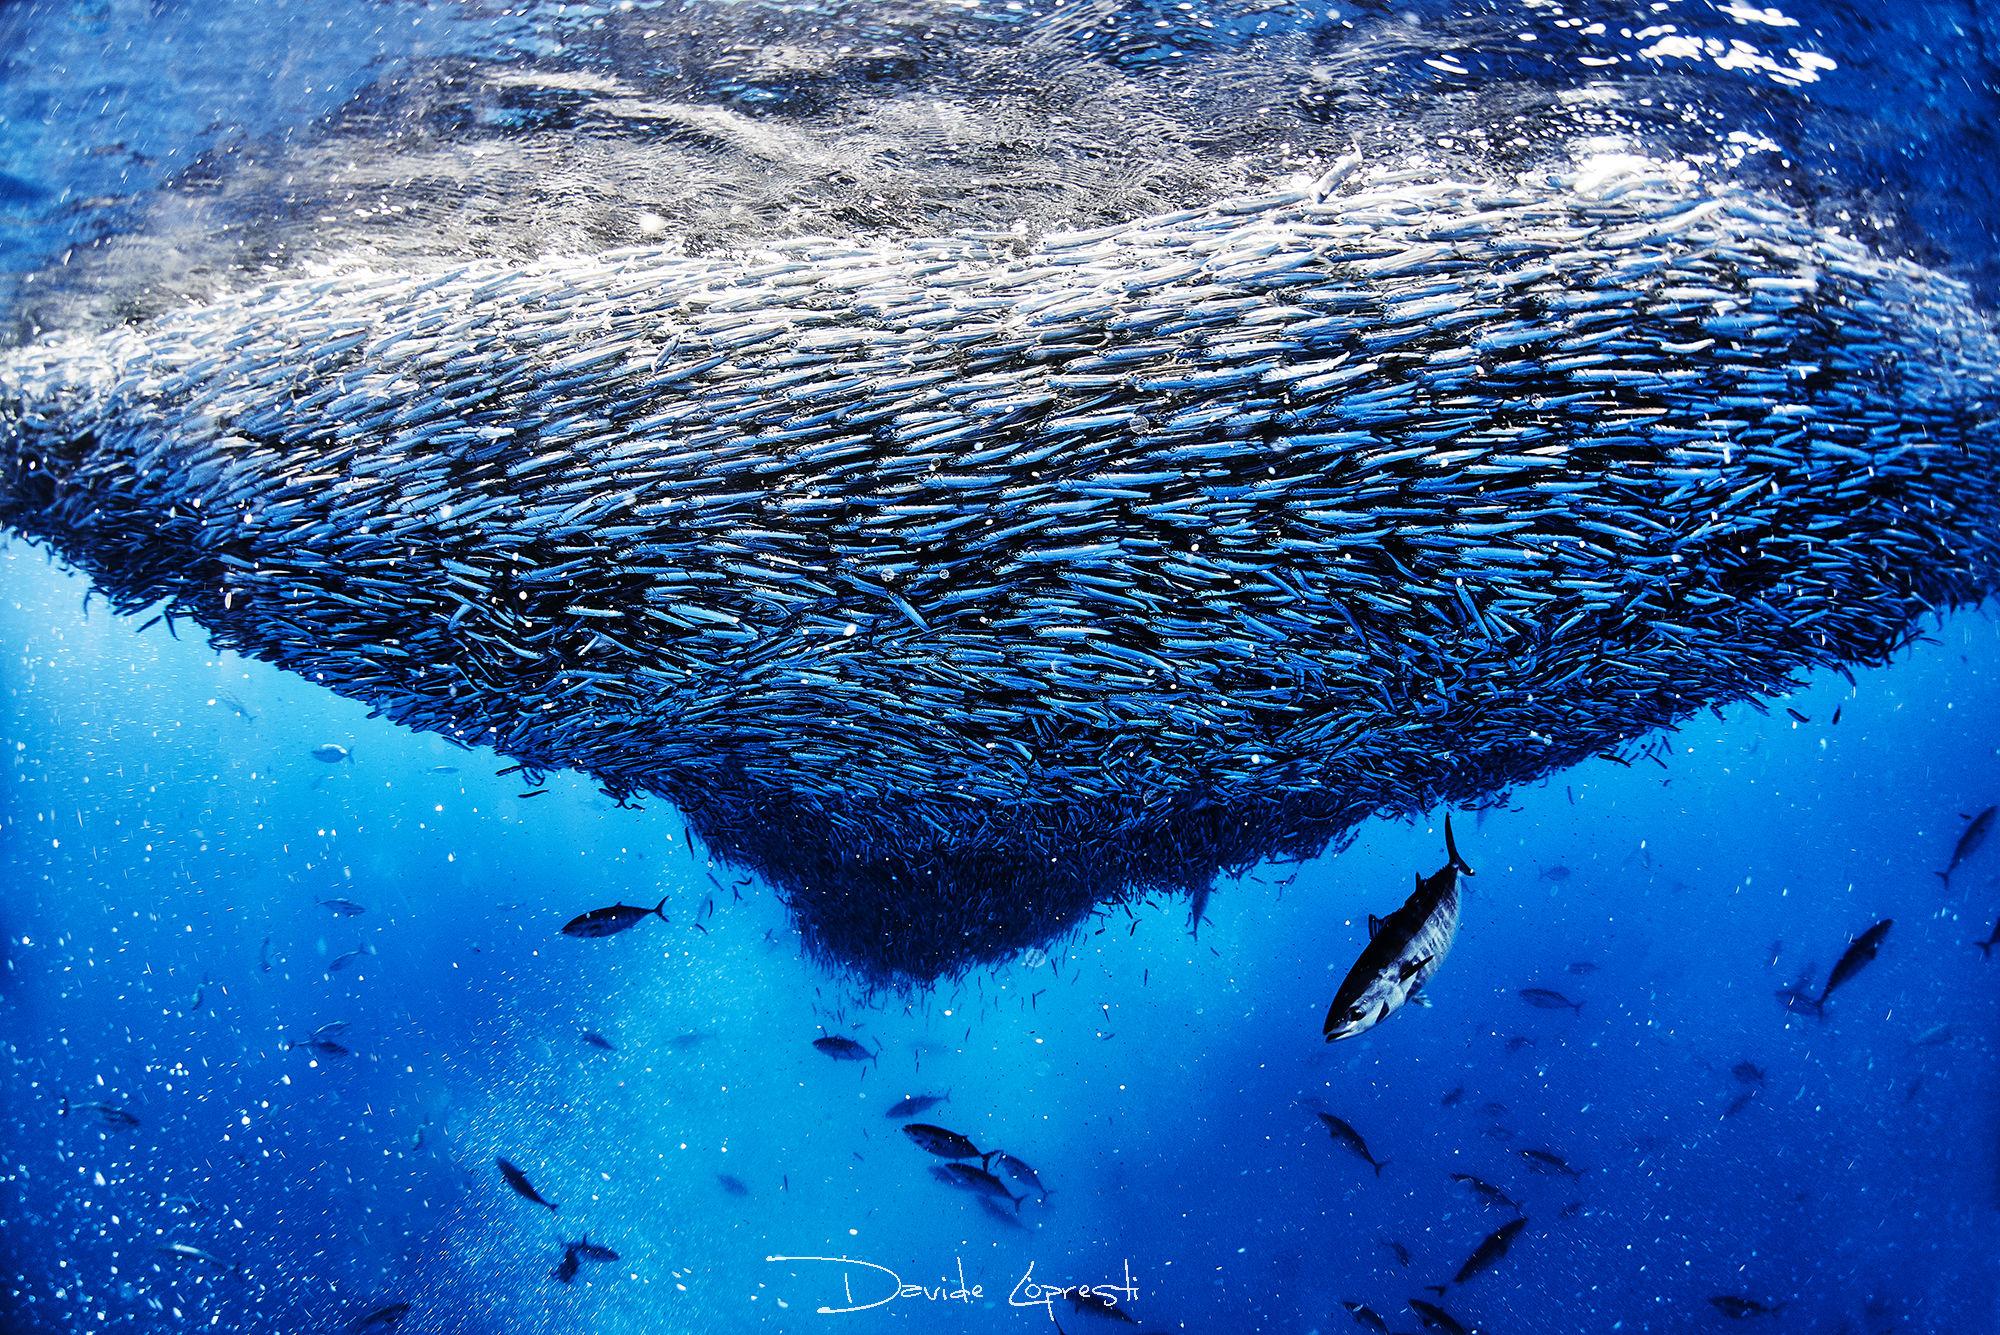 Mediterrean sardine run...